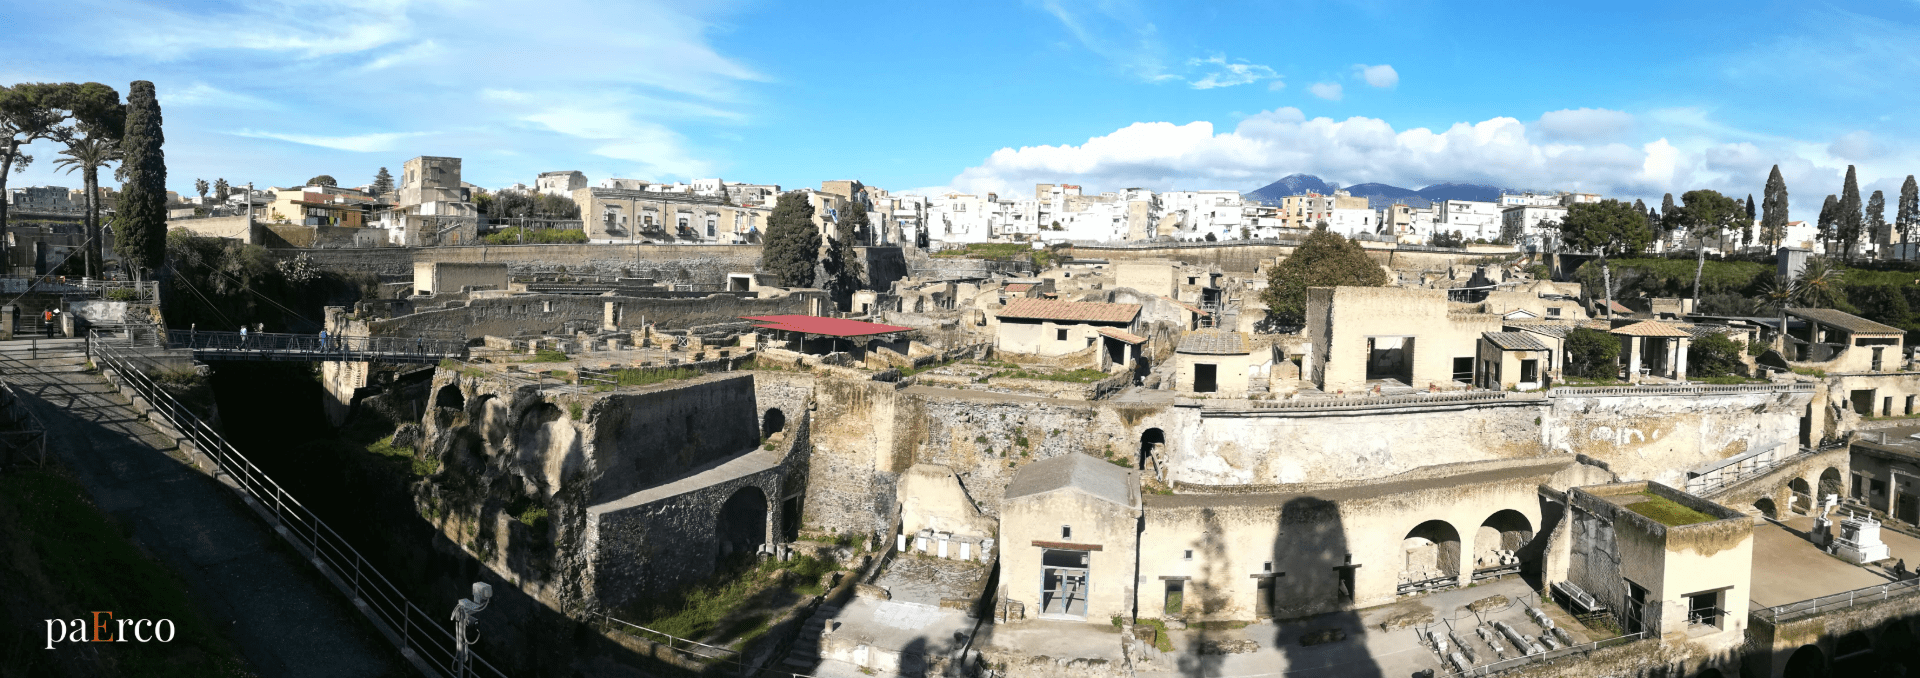 Parco Archeologico di Ercolano - Vista Panoramica